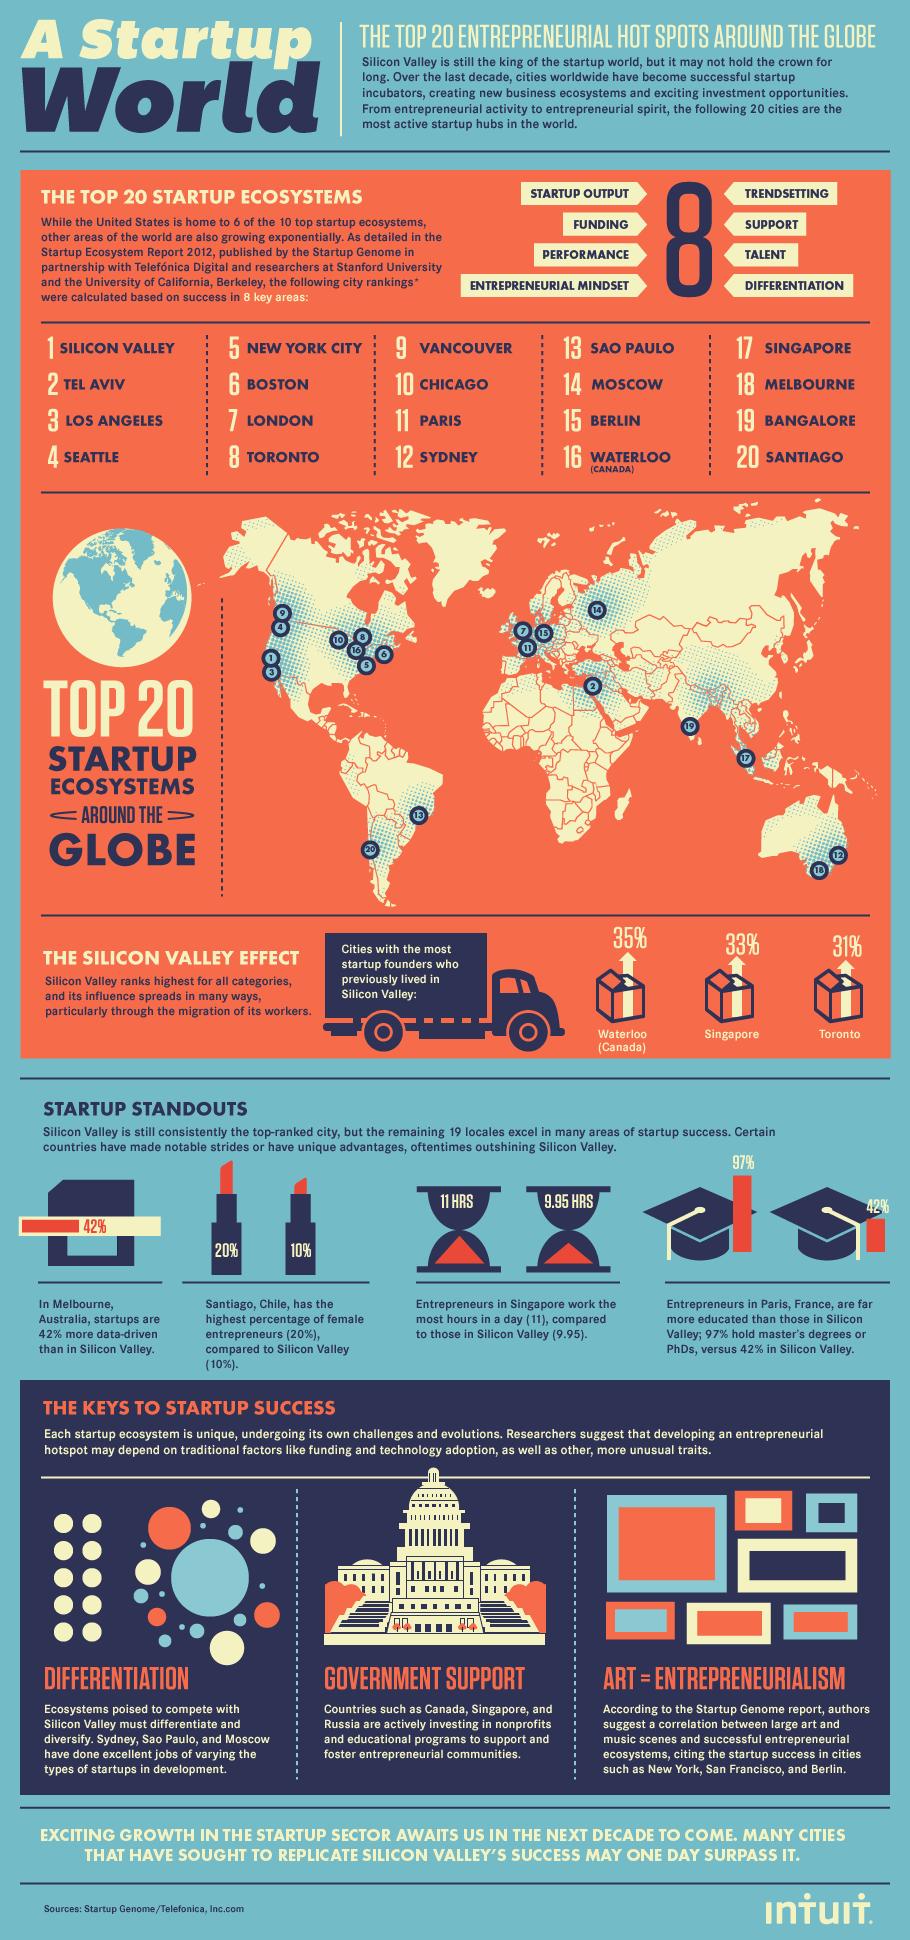 Intuit_startup_hubs_global_final